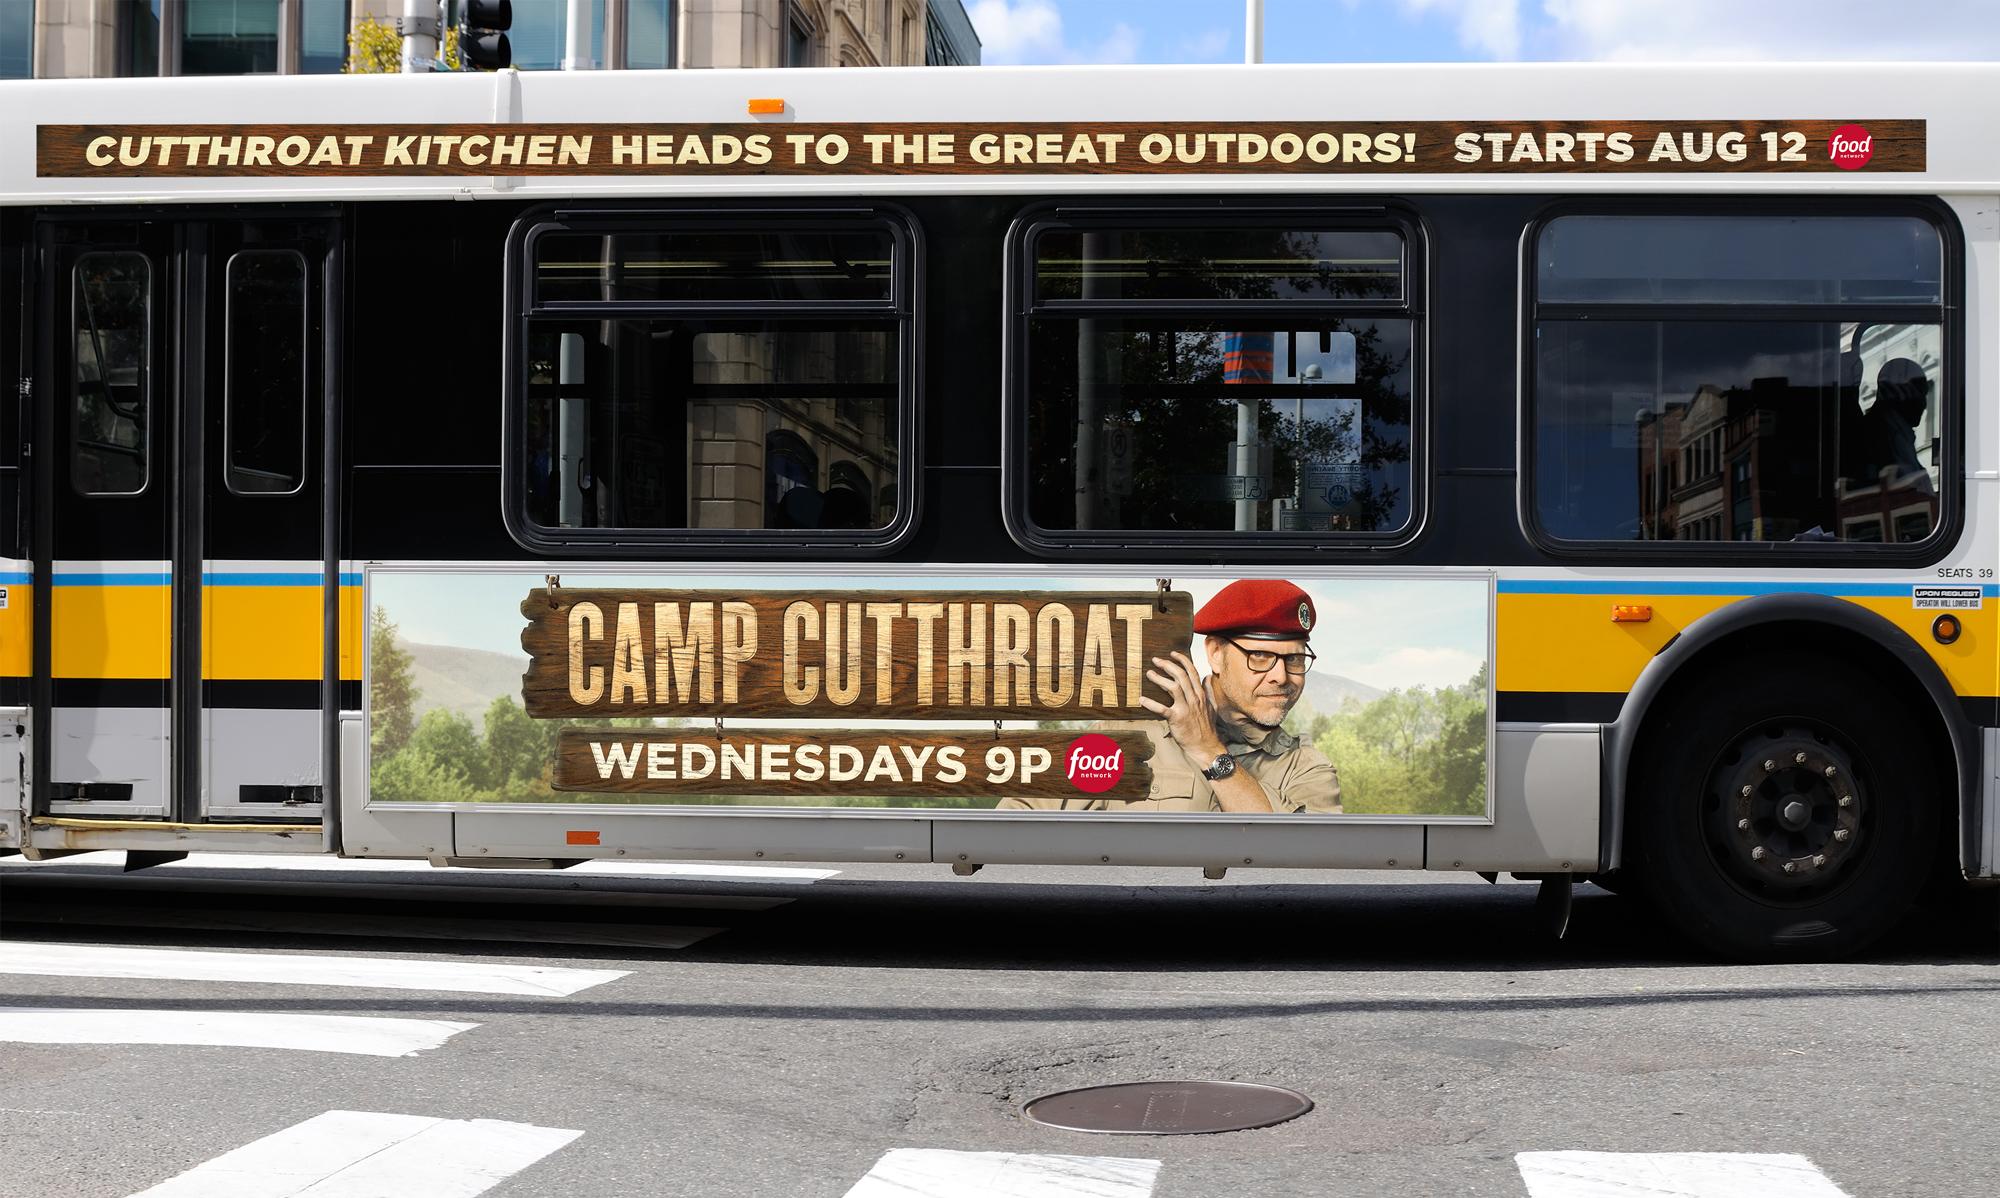 CampCutthroat_Bus_Ad.jpg